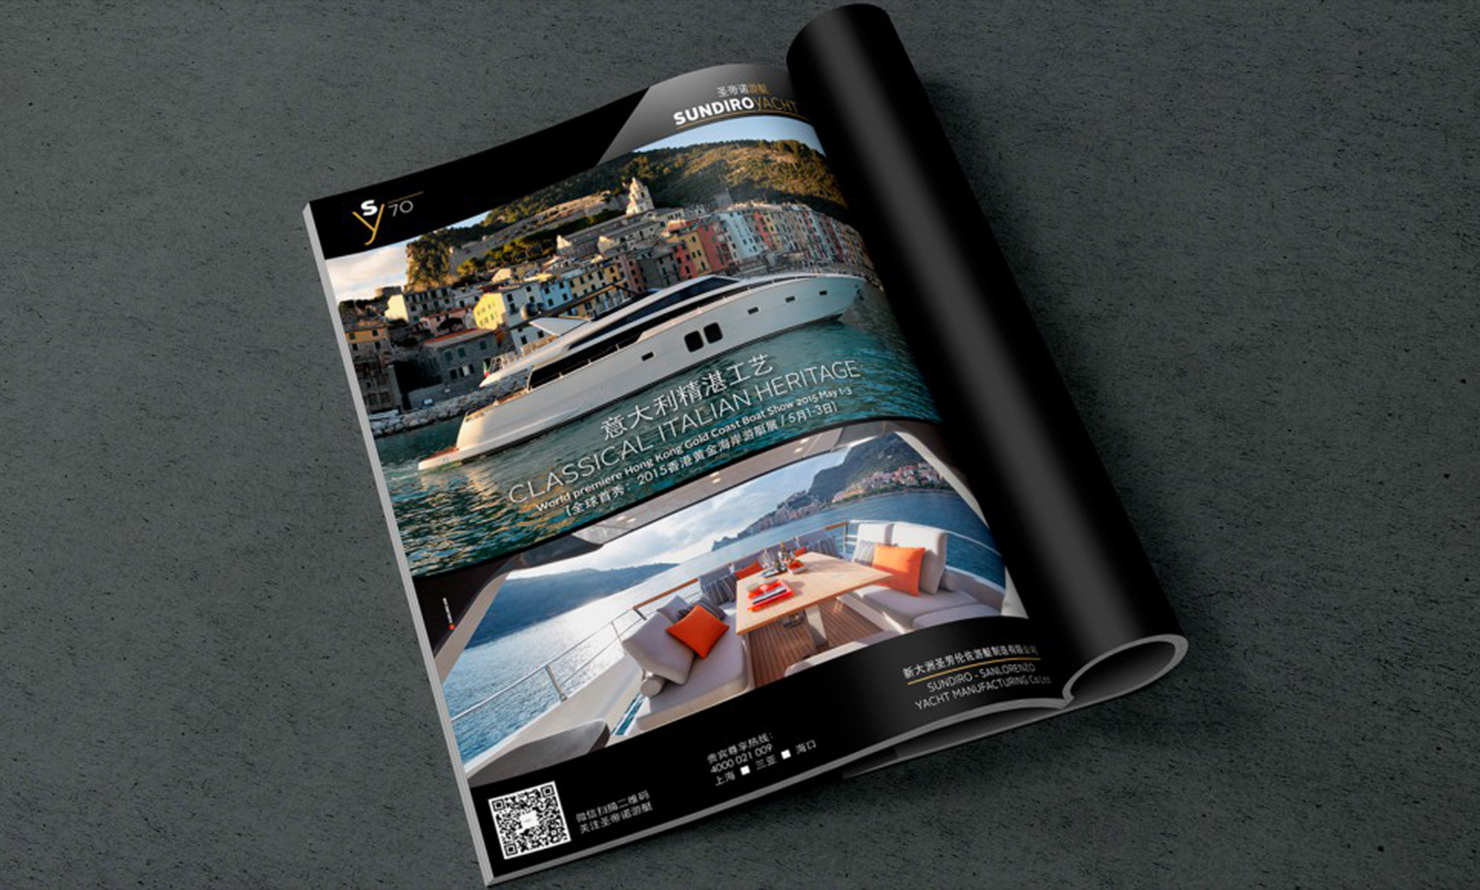 https://kubelibre.com/uploads/Slider-work-tutti-clienti/sundiro-yacht-l-eccelenza-italiana-sbarca-in-cina-4.jpg